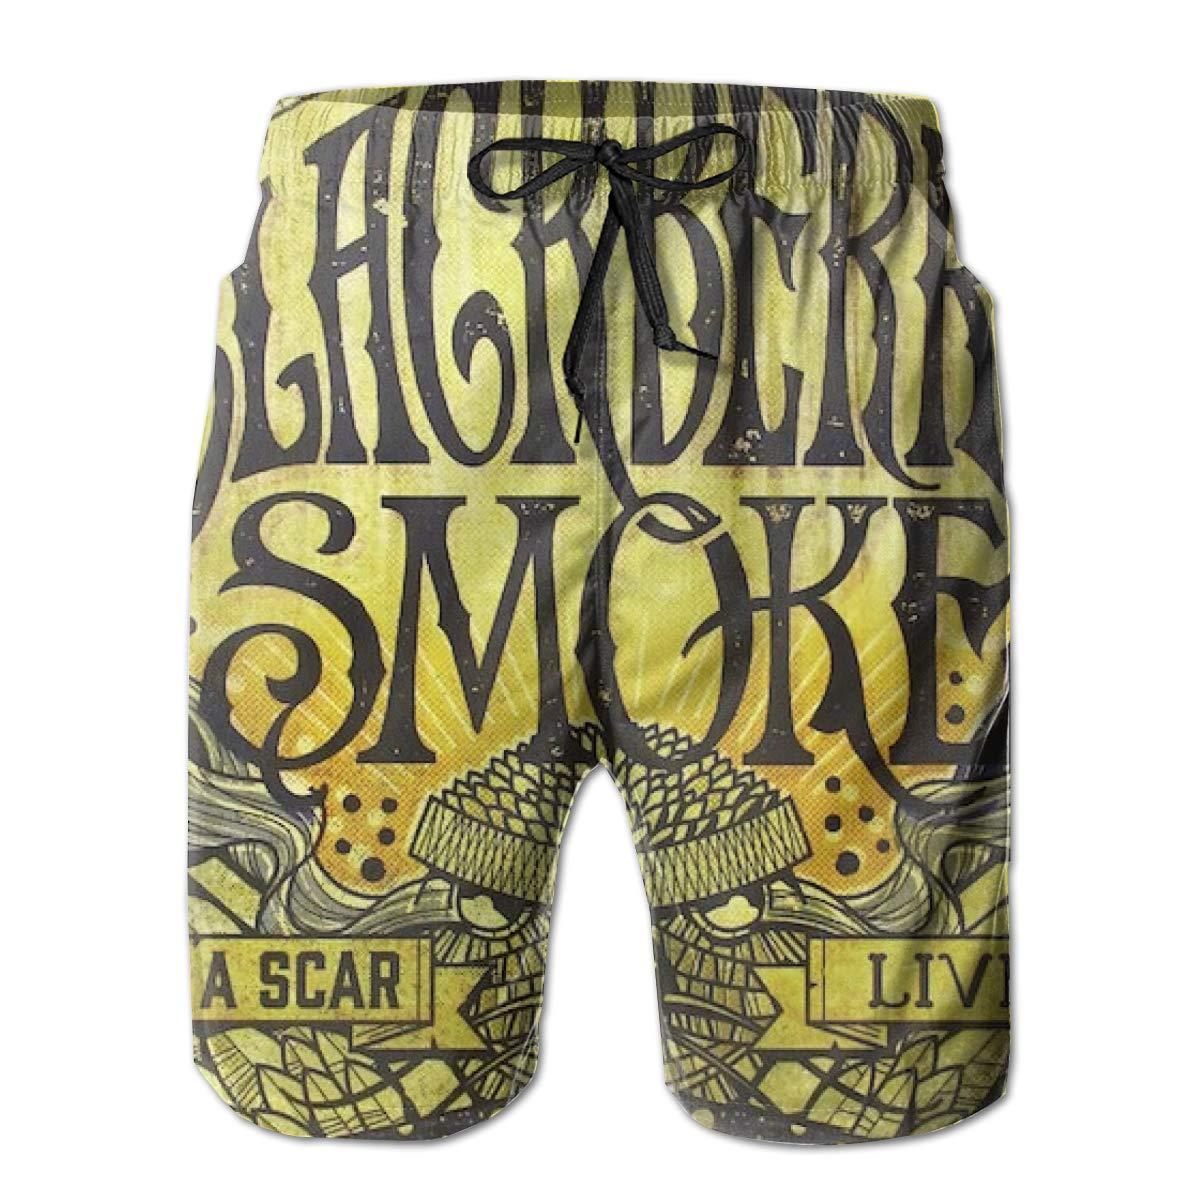 Robert R Castleberry BlackBerry Smoke Leave A Scar Live Men Summer Beach Shorts Surfing Pants